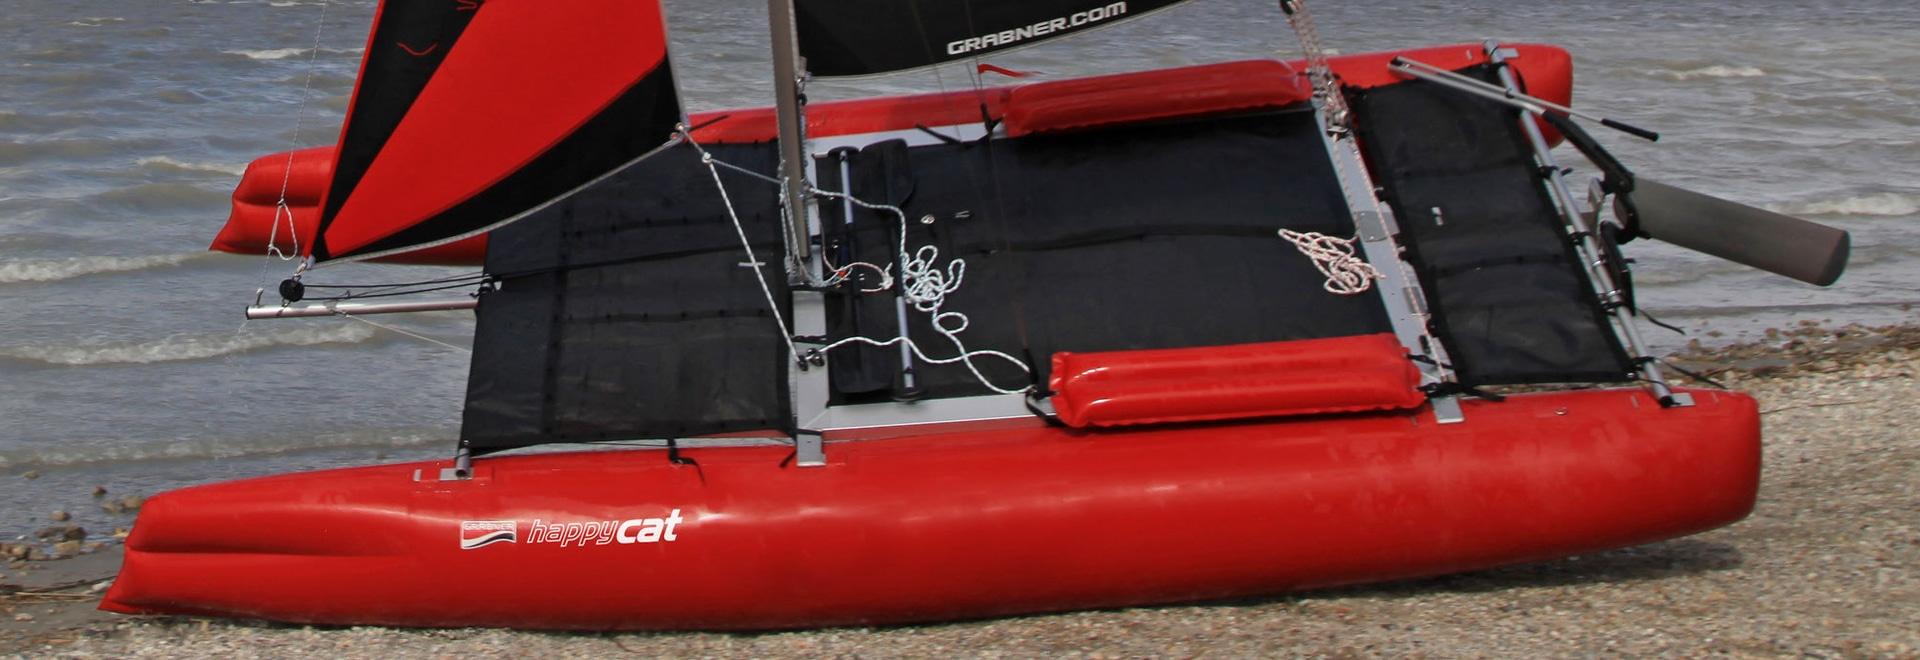 NOVITÁ: Coperta di poppa per catamarani da viaggio smontabili HAPPY CAT HURRICANE